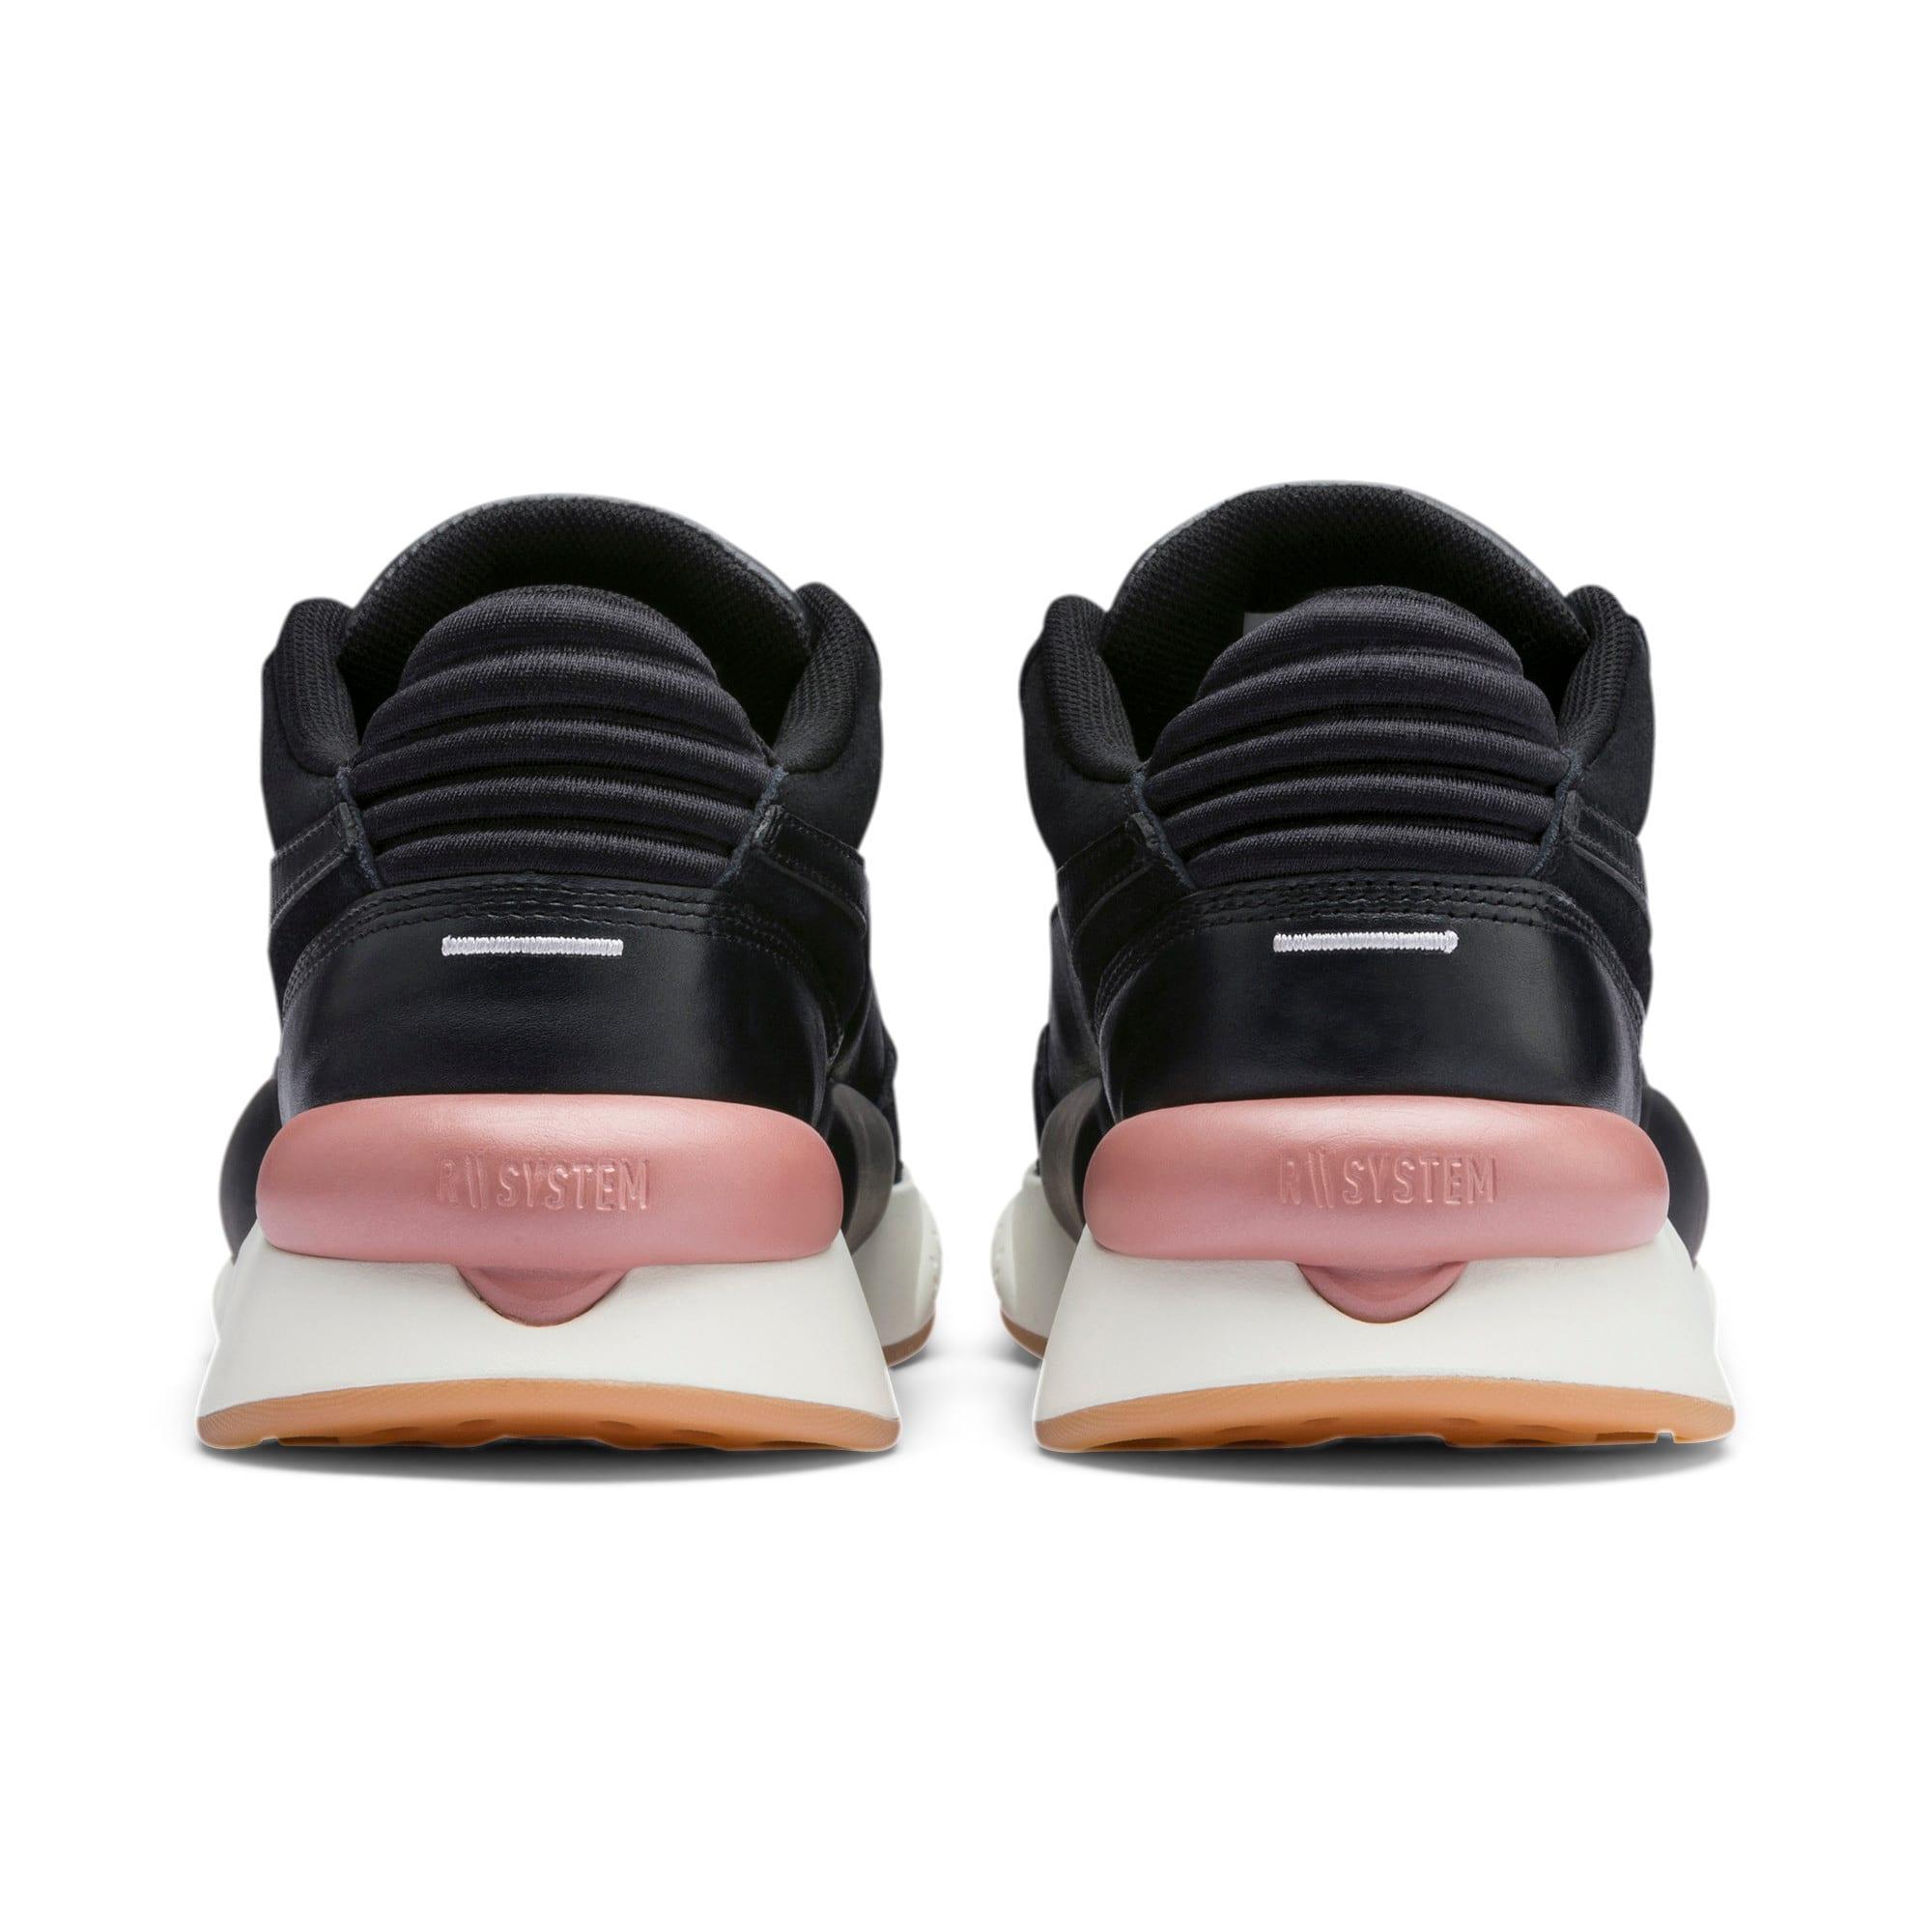 Thumbnail 4 of RS 9.8 Metallic Women's Sneakers, Puma Black Heather, medium